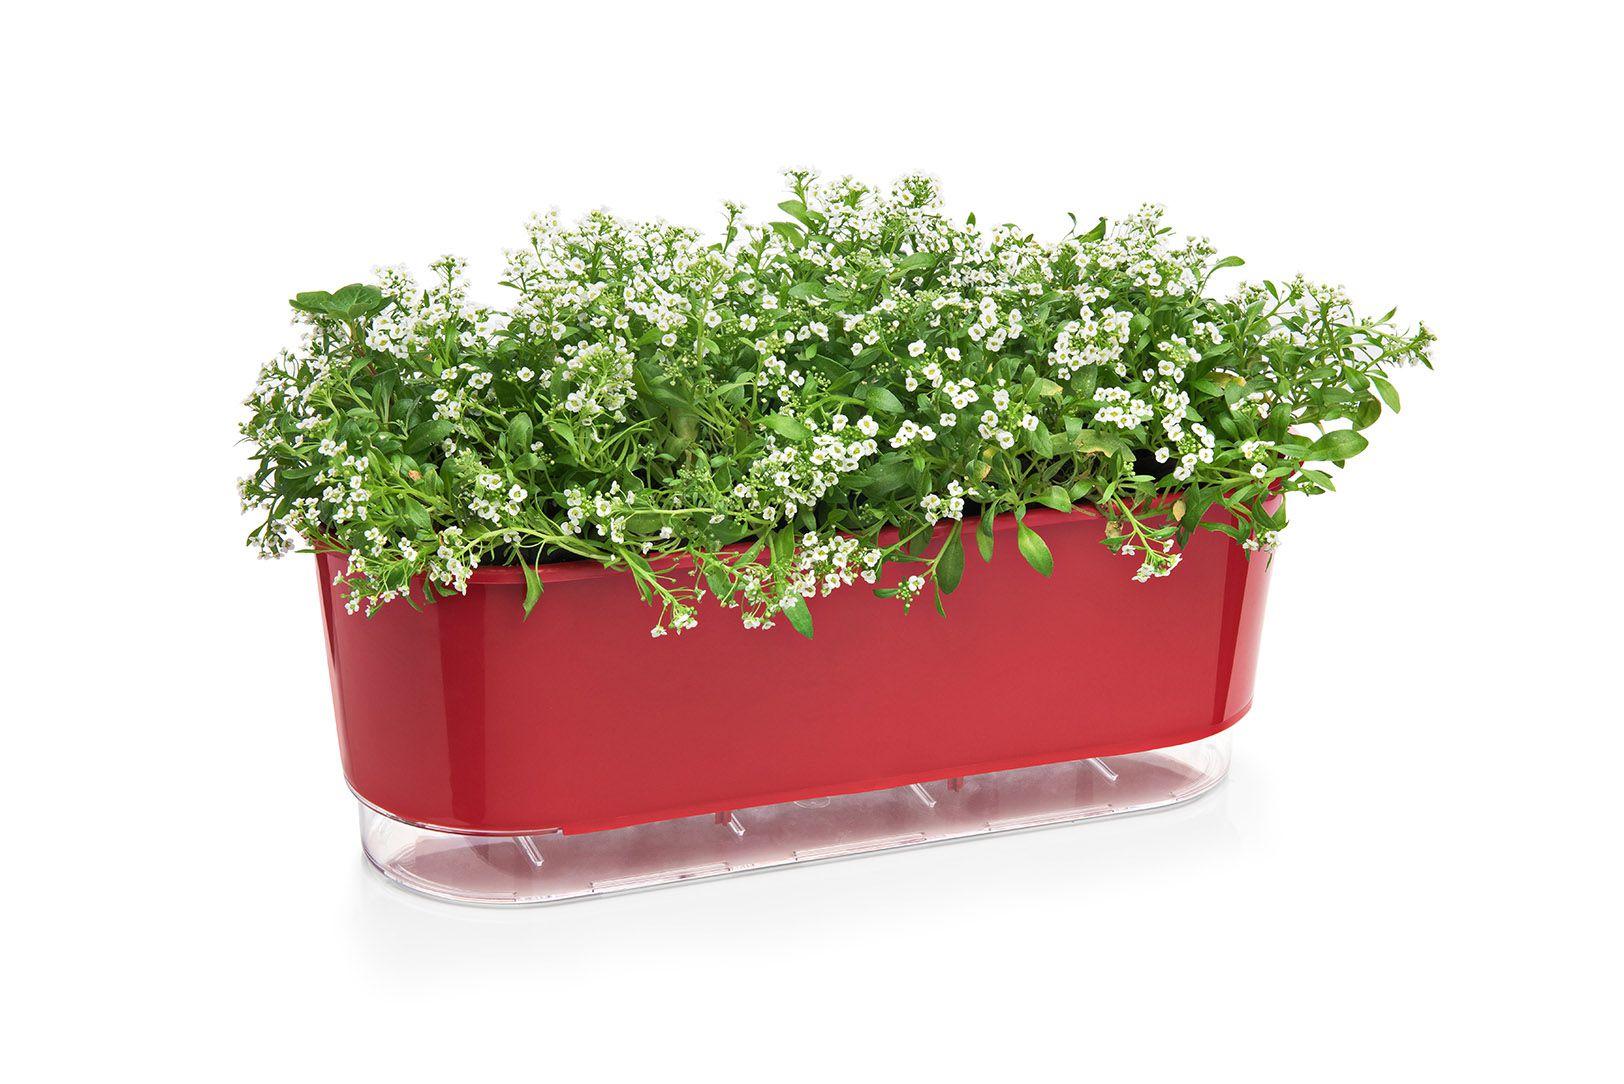 Jardineira Autoirrigável  Vermelho Raiz